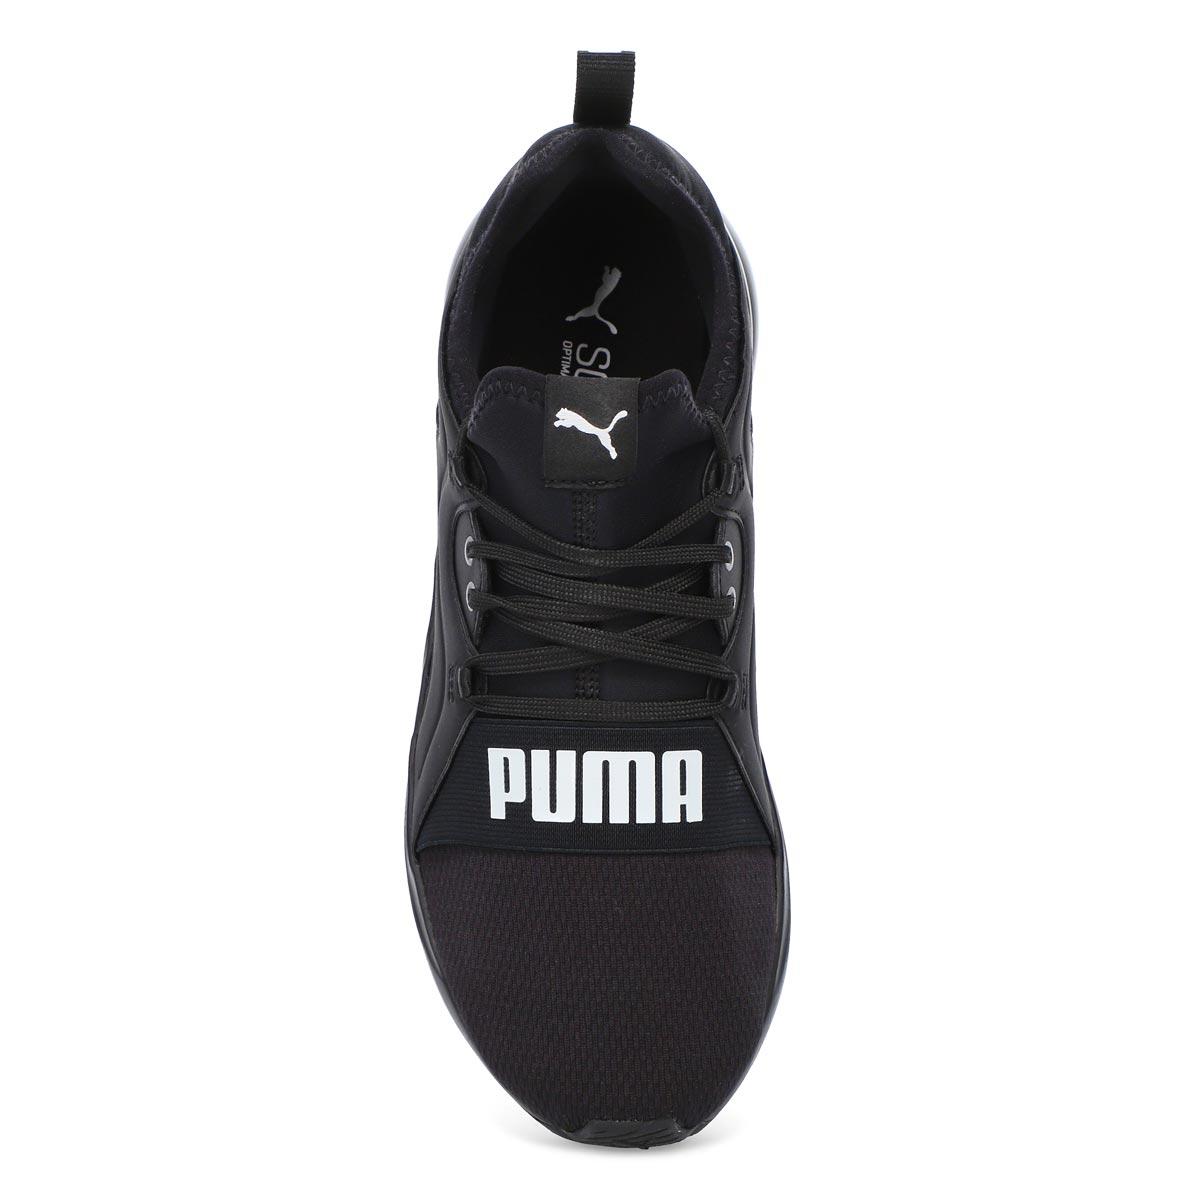 Men's Softright Rift Breeze Sneaker - Black